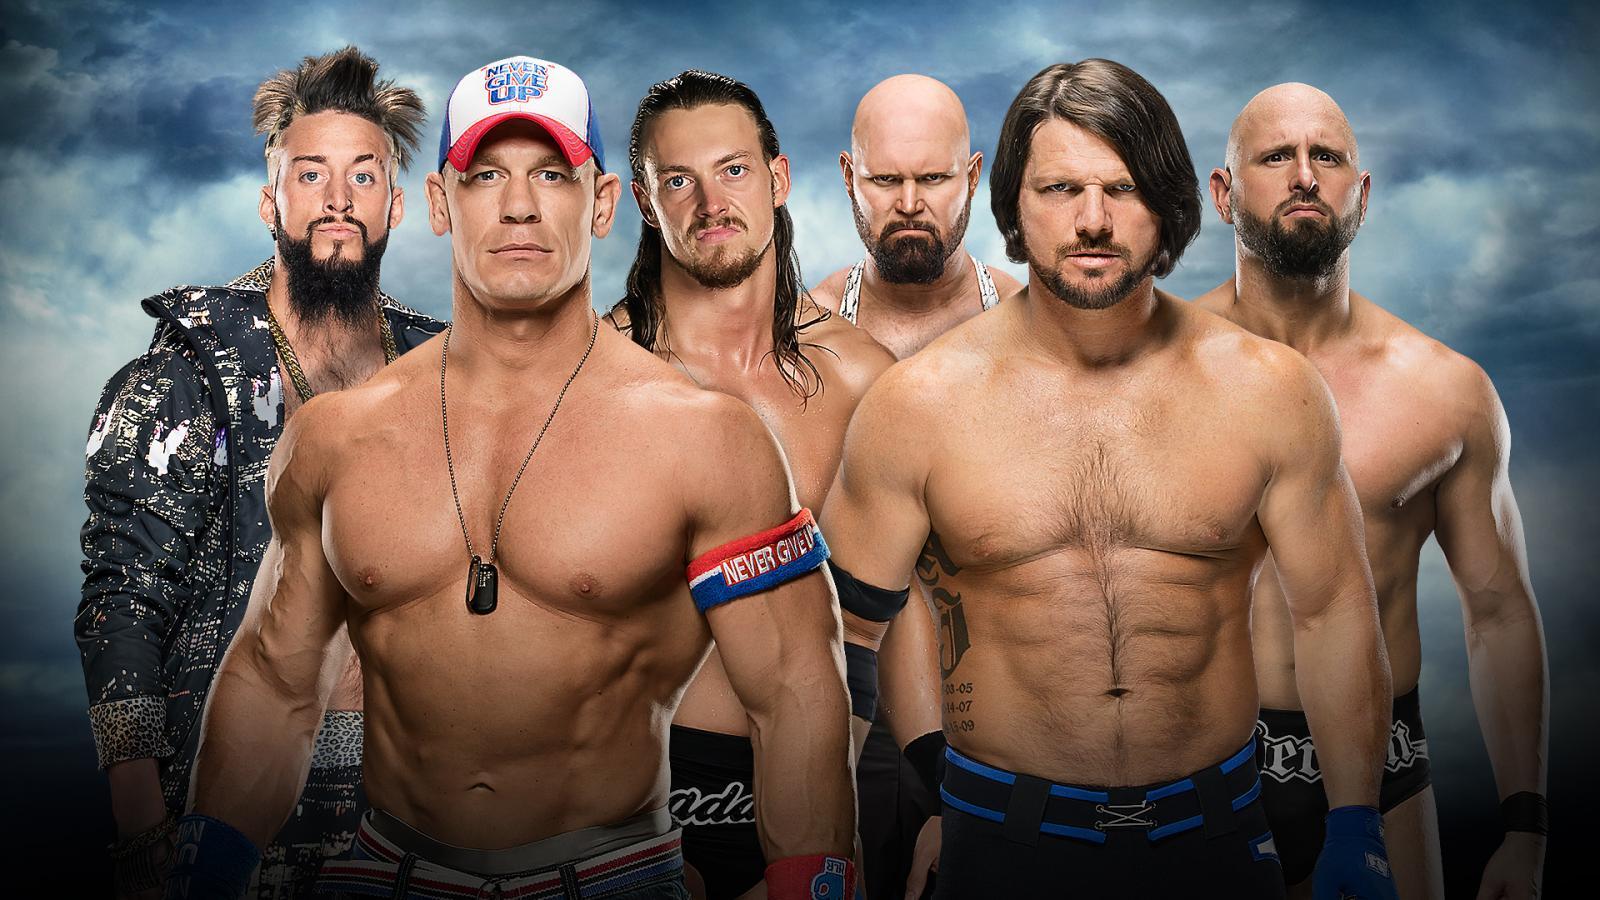 Battleground 2016 - John Cena, Big Cass & Enzo Amore Vs. The Club